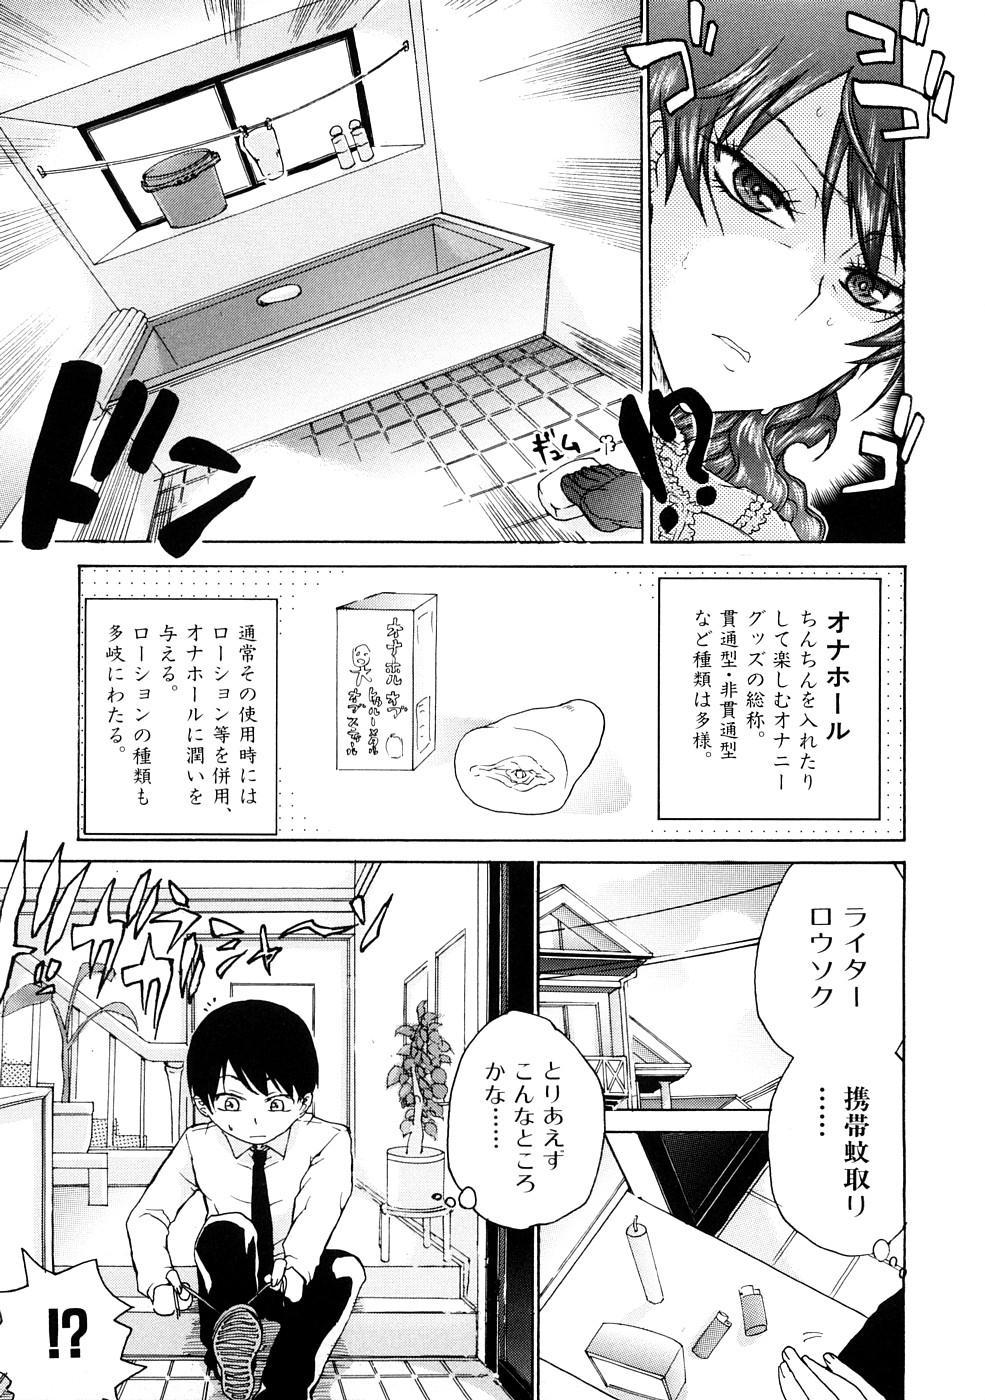 Ecchi de Jibunkatte de Kawaii Ko 132